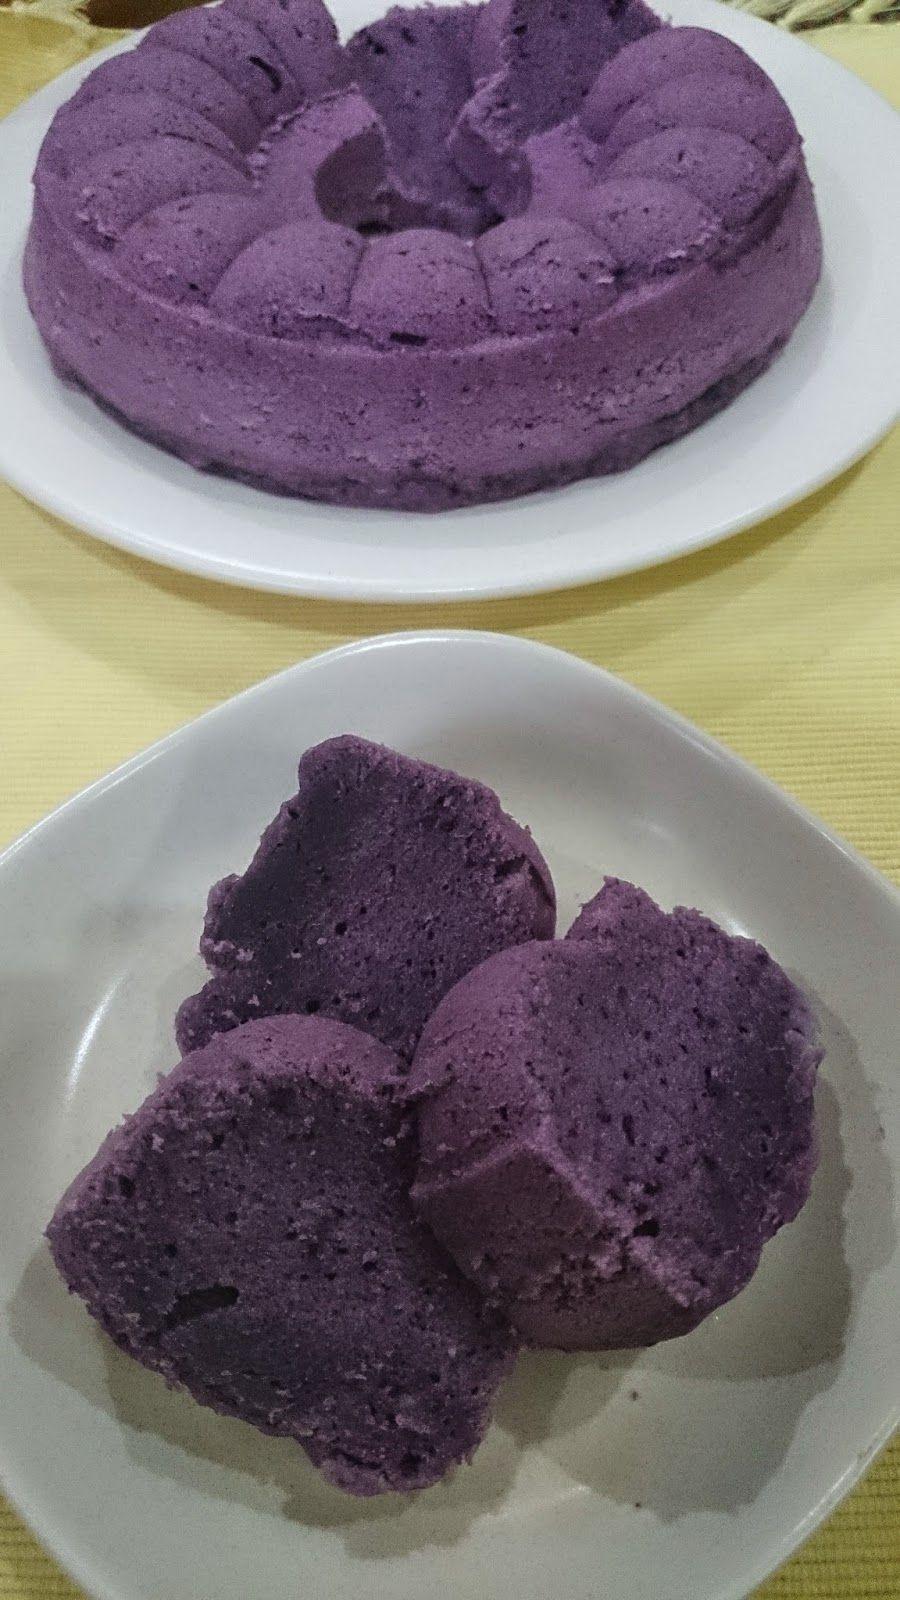 Rumah Makan Djowo Klaten Bolu Ubi Ungu Jepang Kukus Makanan Kue Lezat Makanan Manis